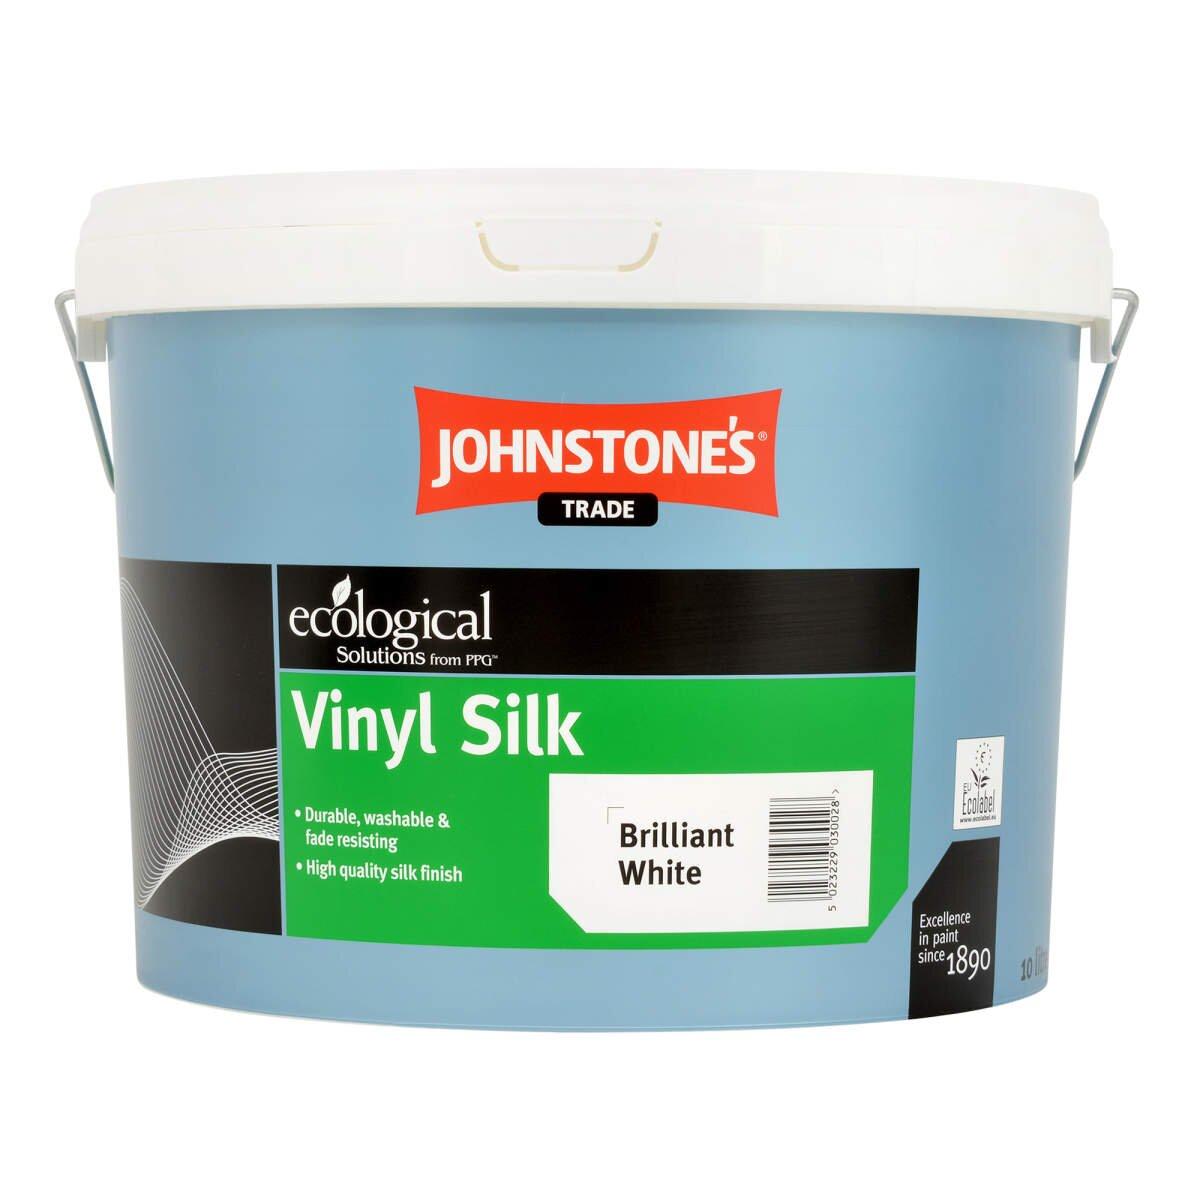 Johnstones Trade Vinyl Silk Brilliant White 10l